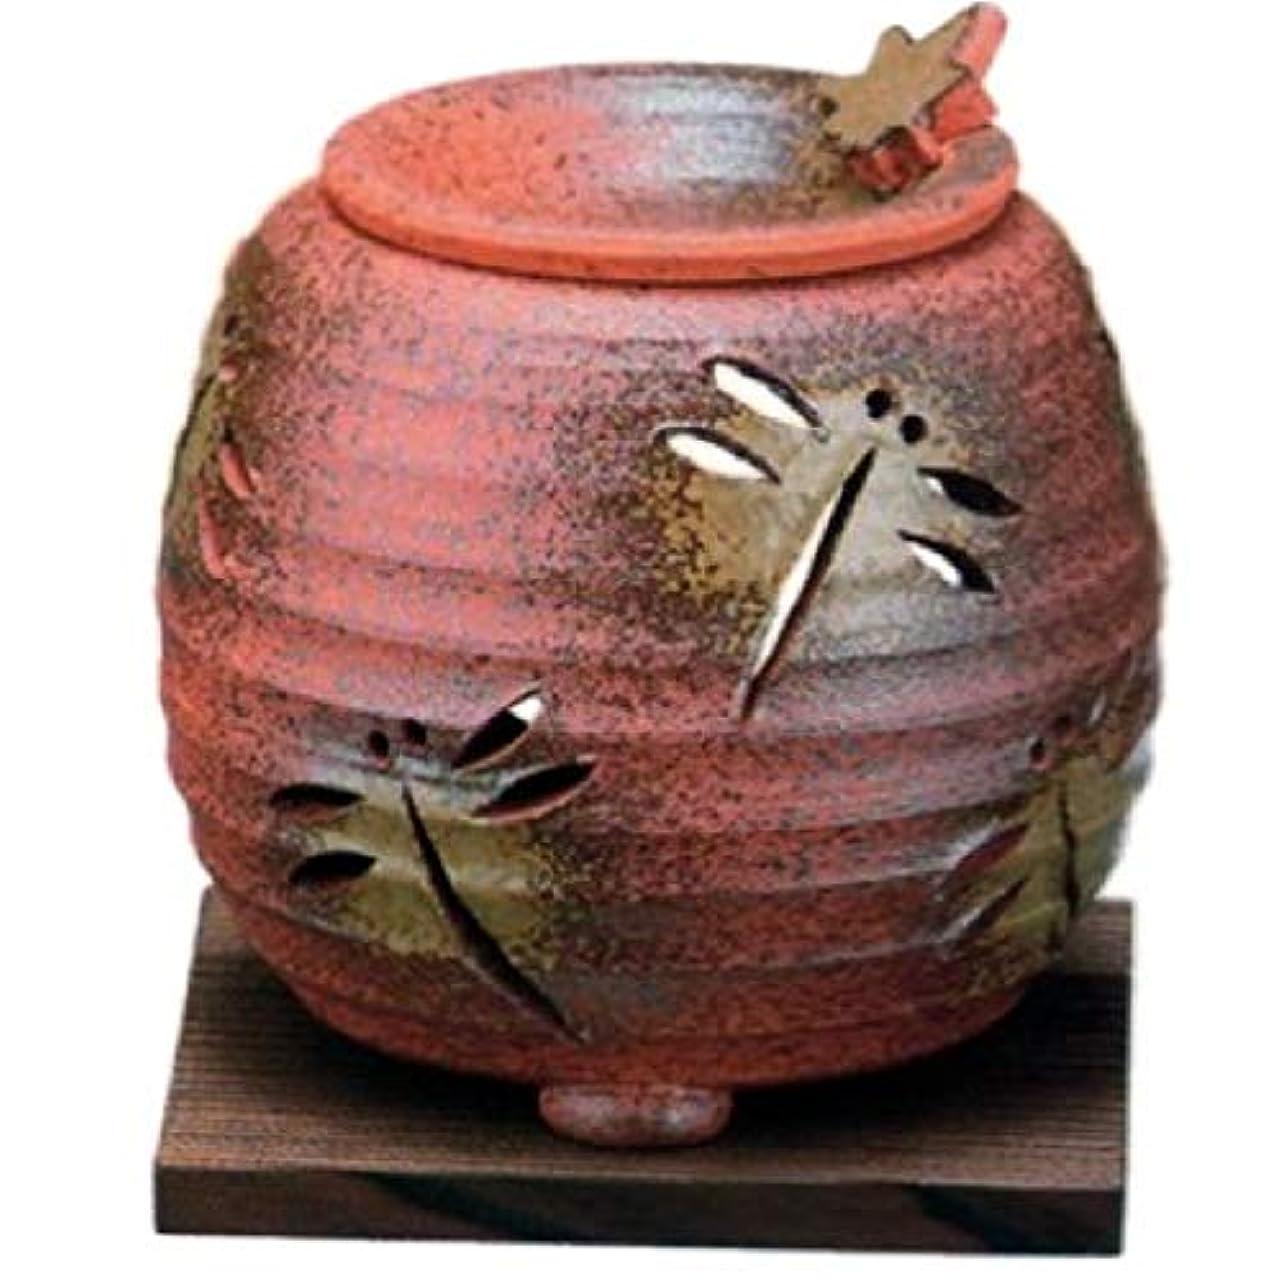 ハグ懐用語集常滑焼?石龍窯 カ38-07 茶香炉 トンボ 焼杉板付 約φ11×11cm